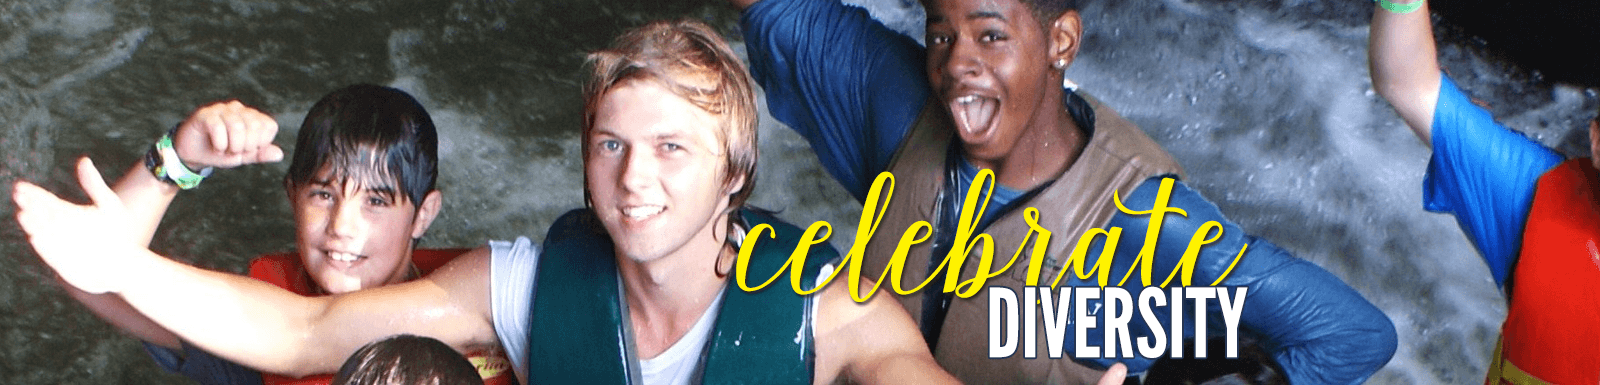 Celebrate diversity at Camp Kupugani